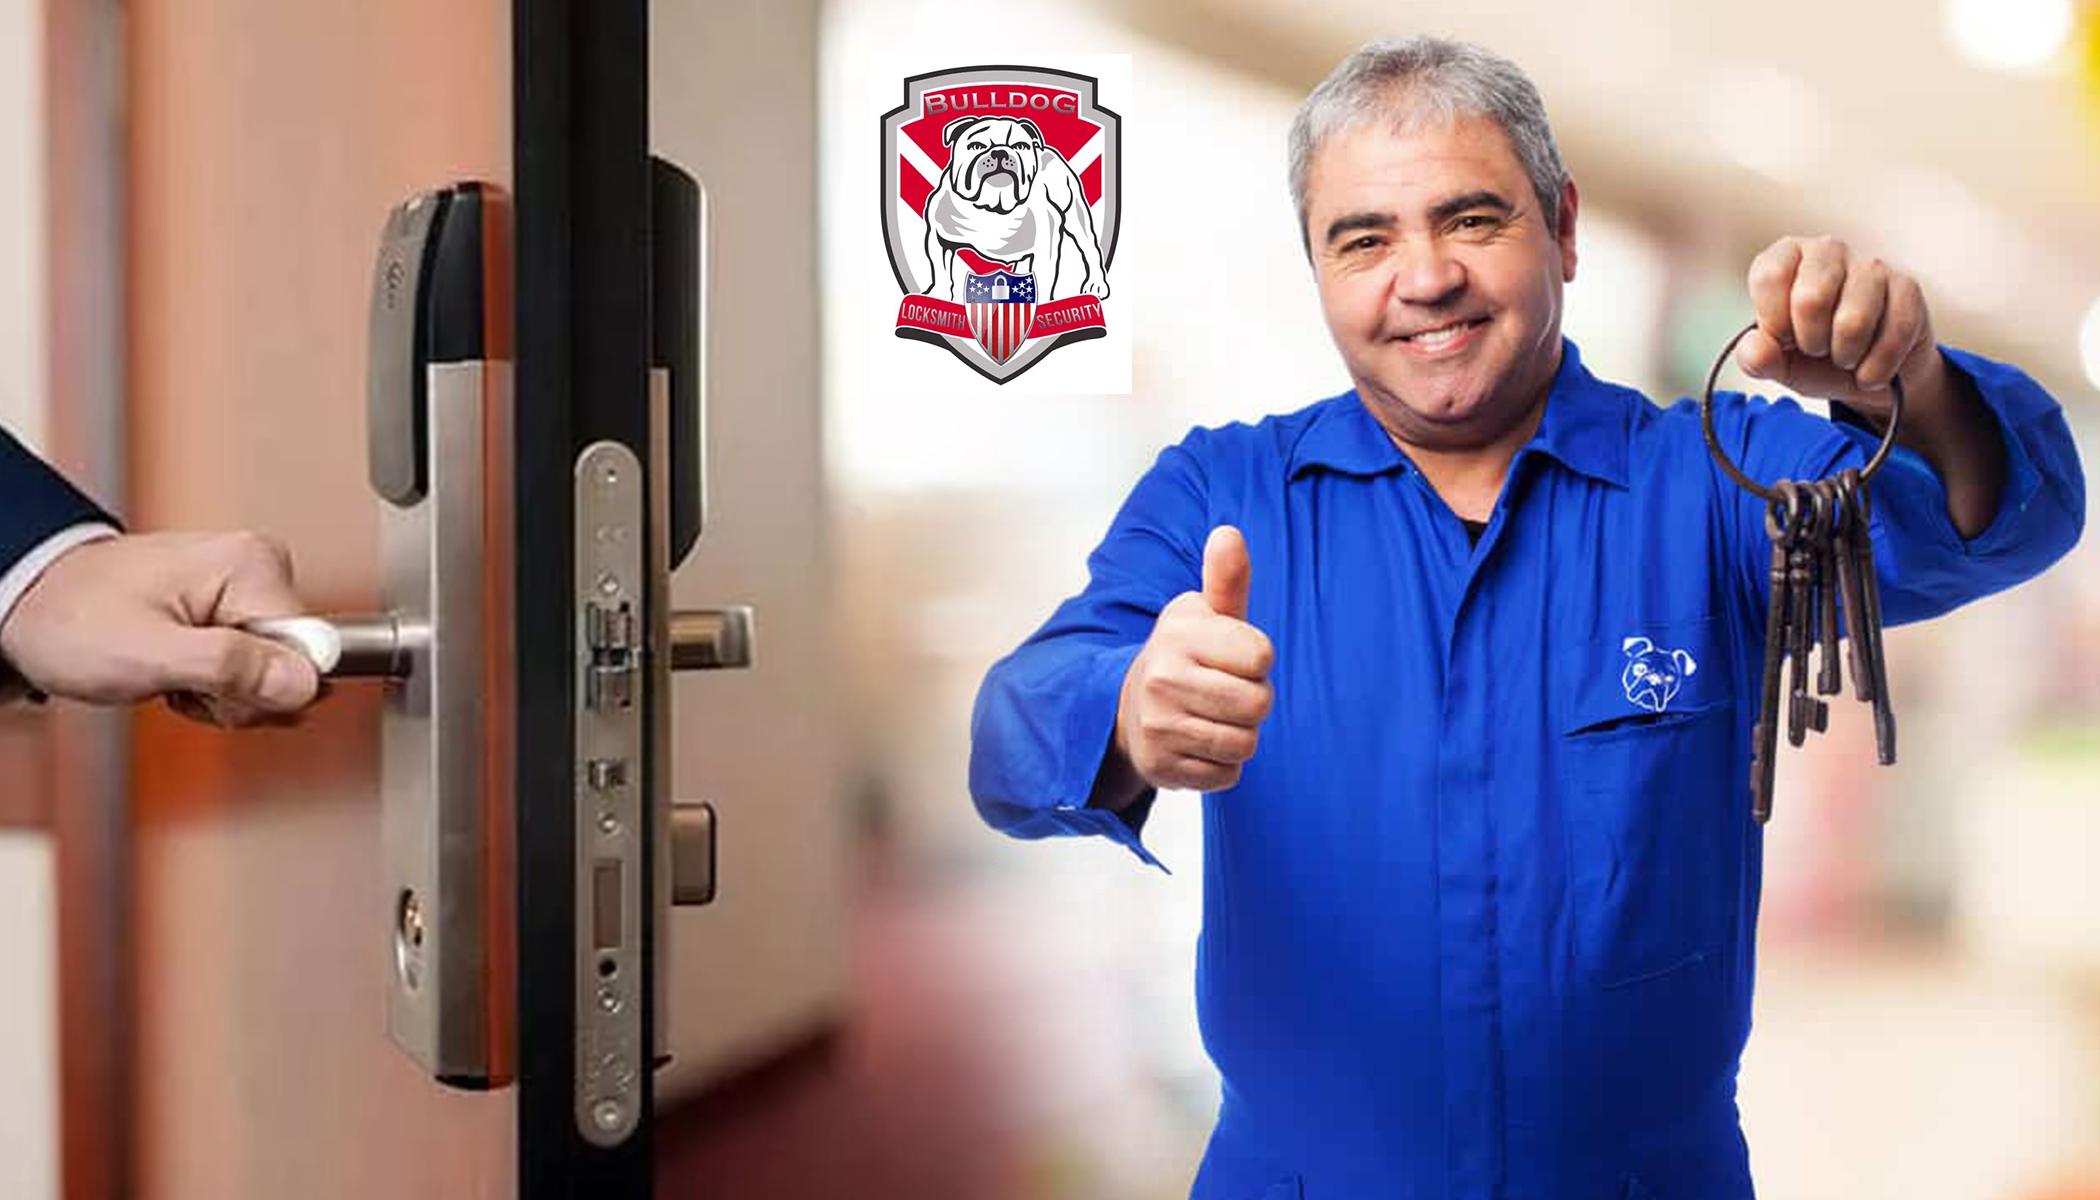 Bulldog Locksmith & Security